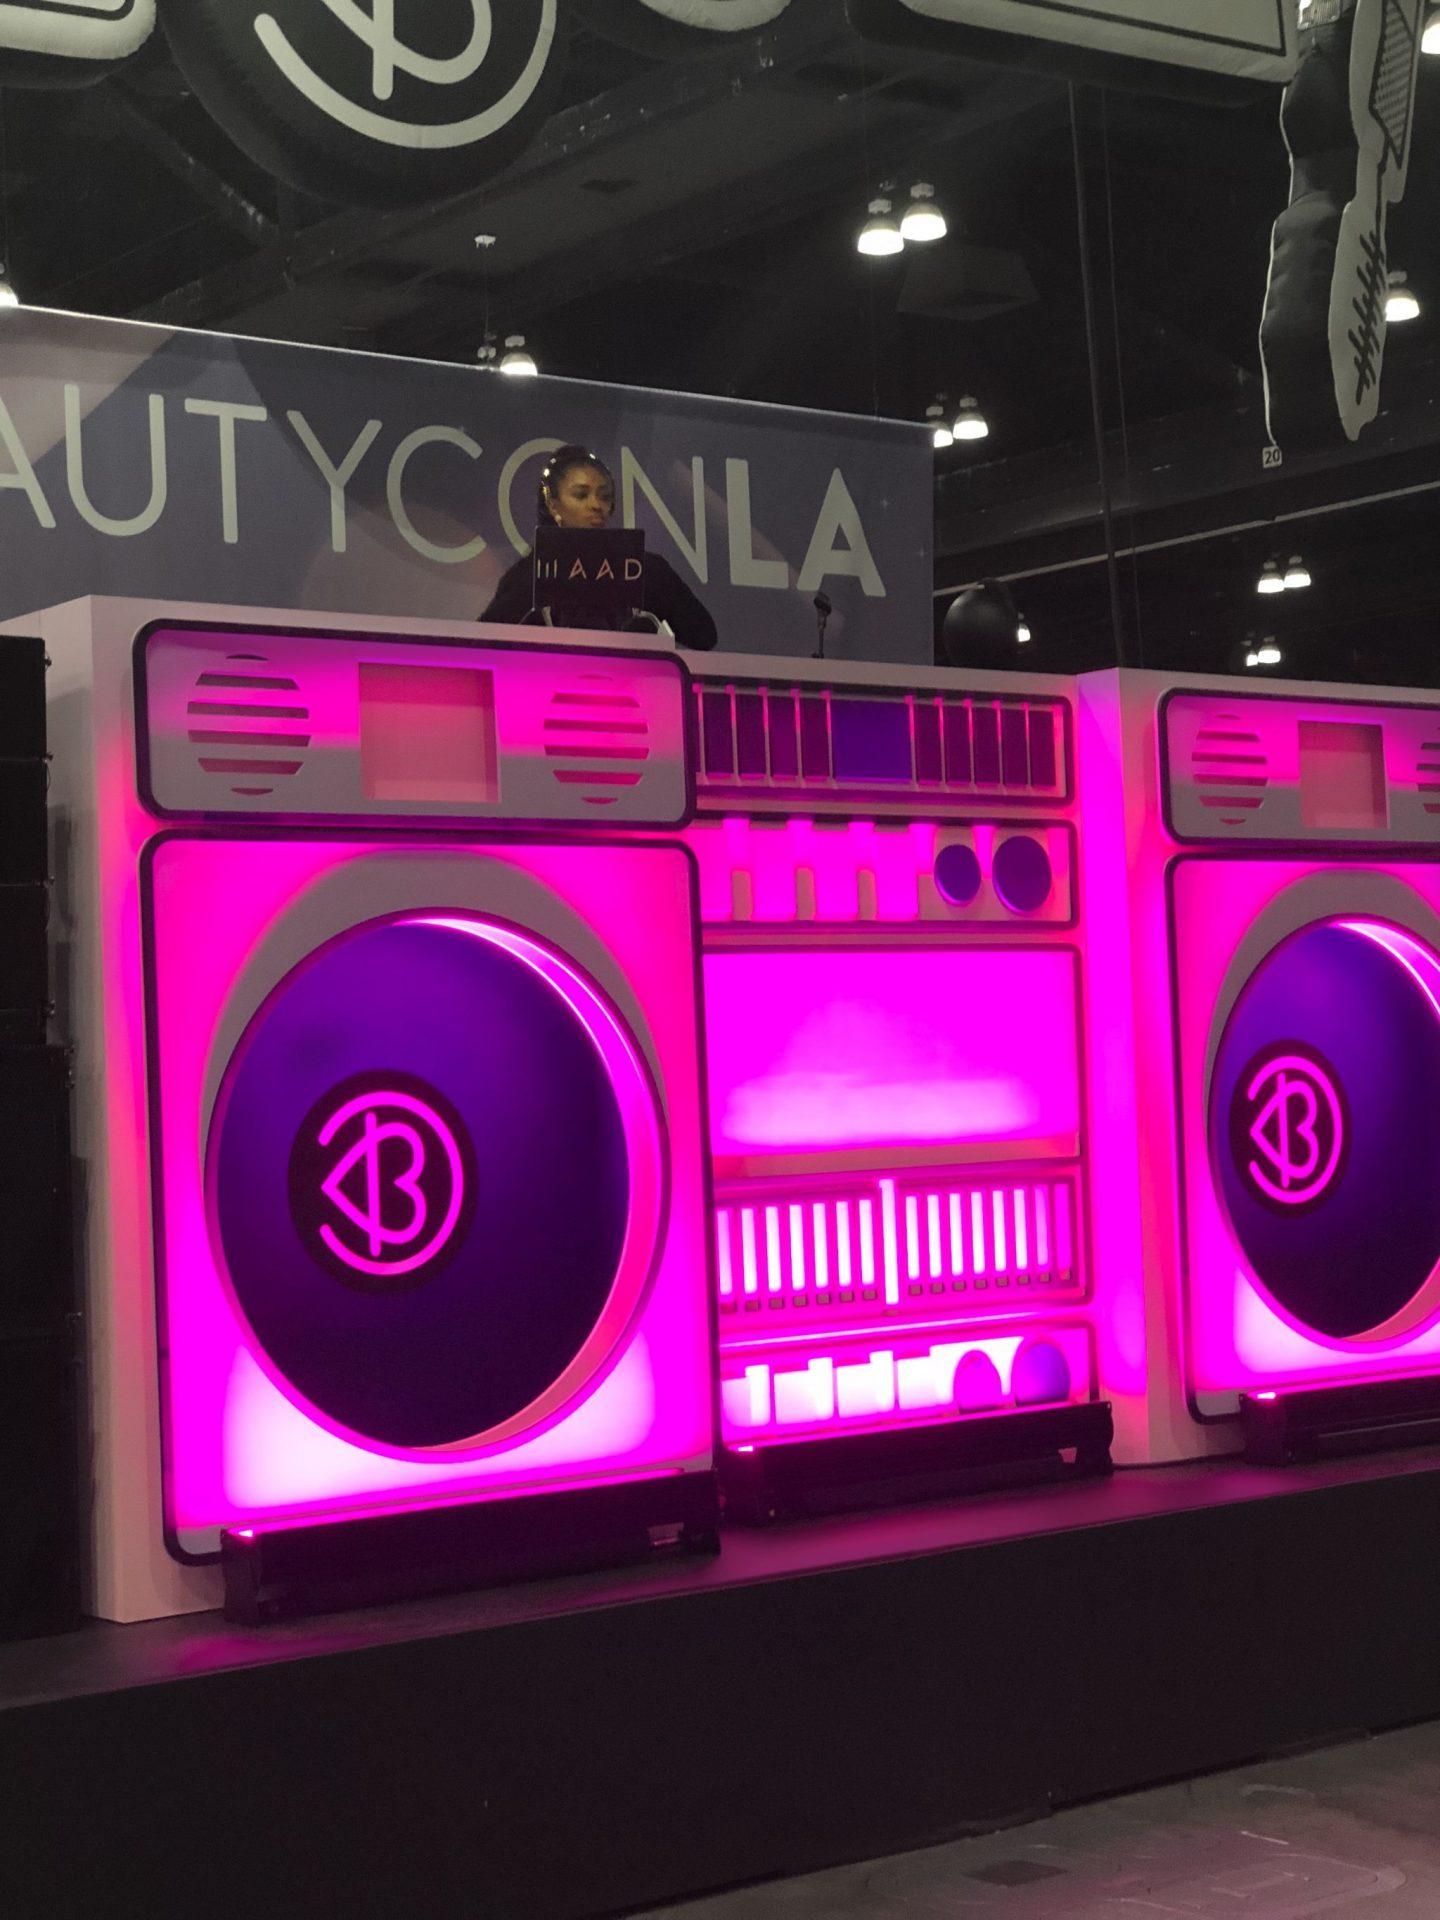 DJ Booth #Beautycon